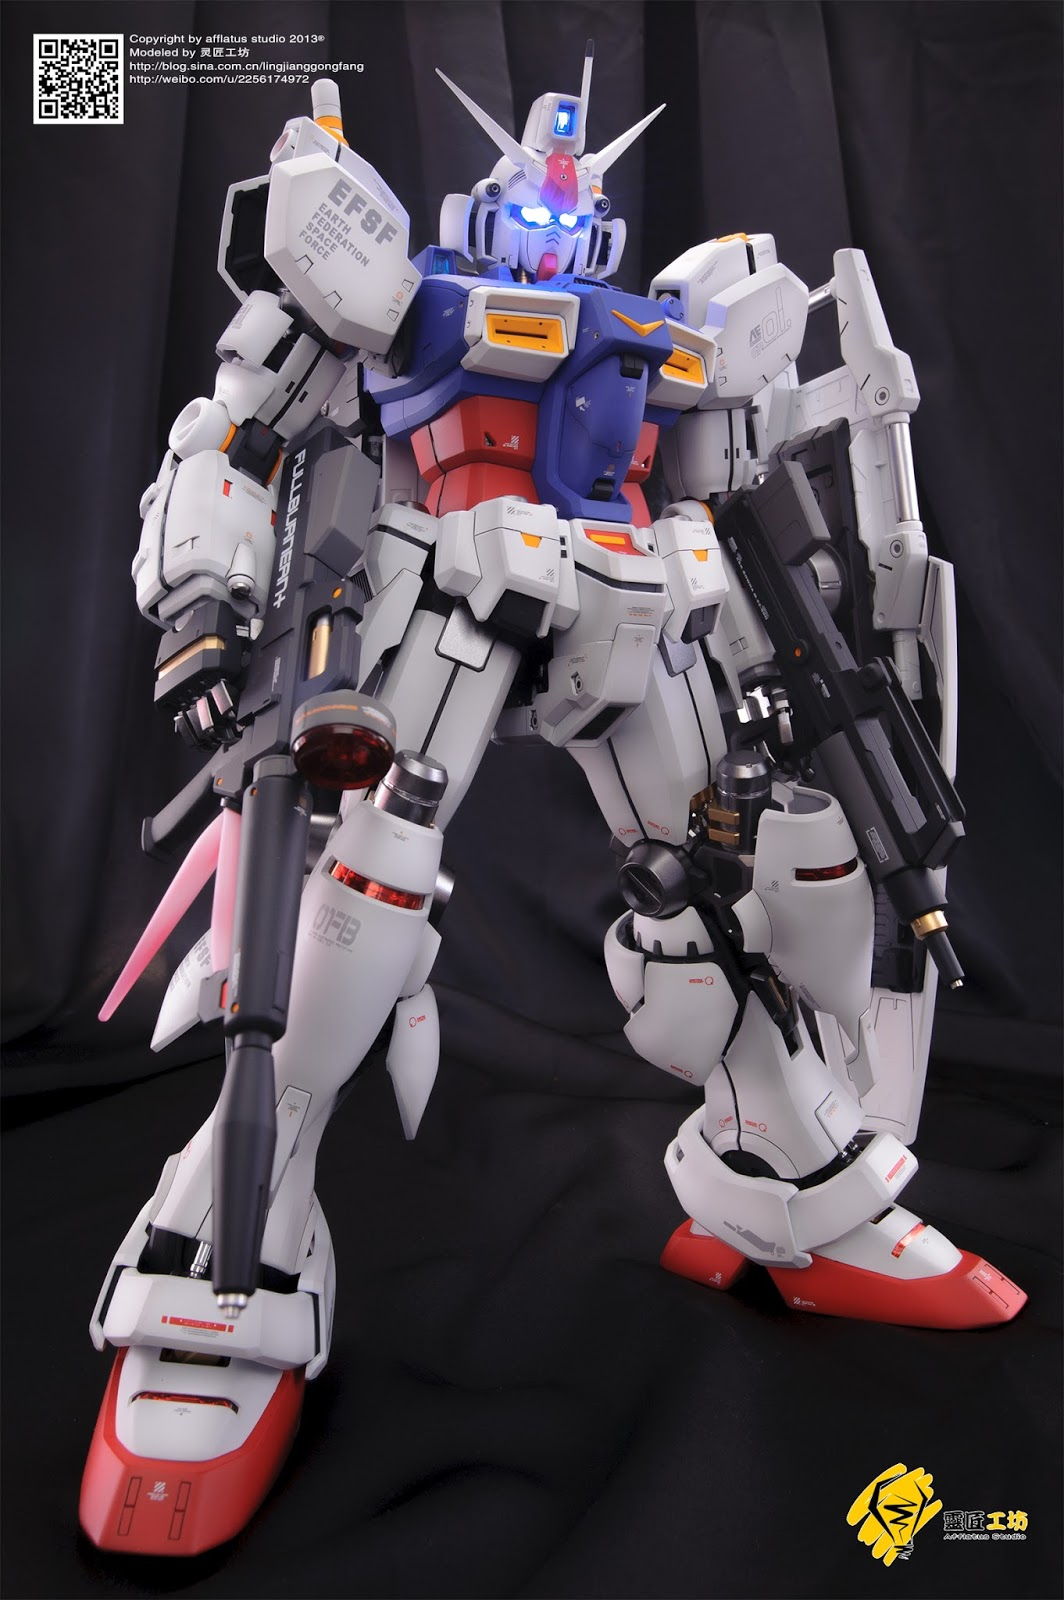 Custom Build: PG 1/60 RX-78GP01 Gundam GP01 Zephyranthes